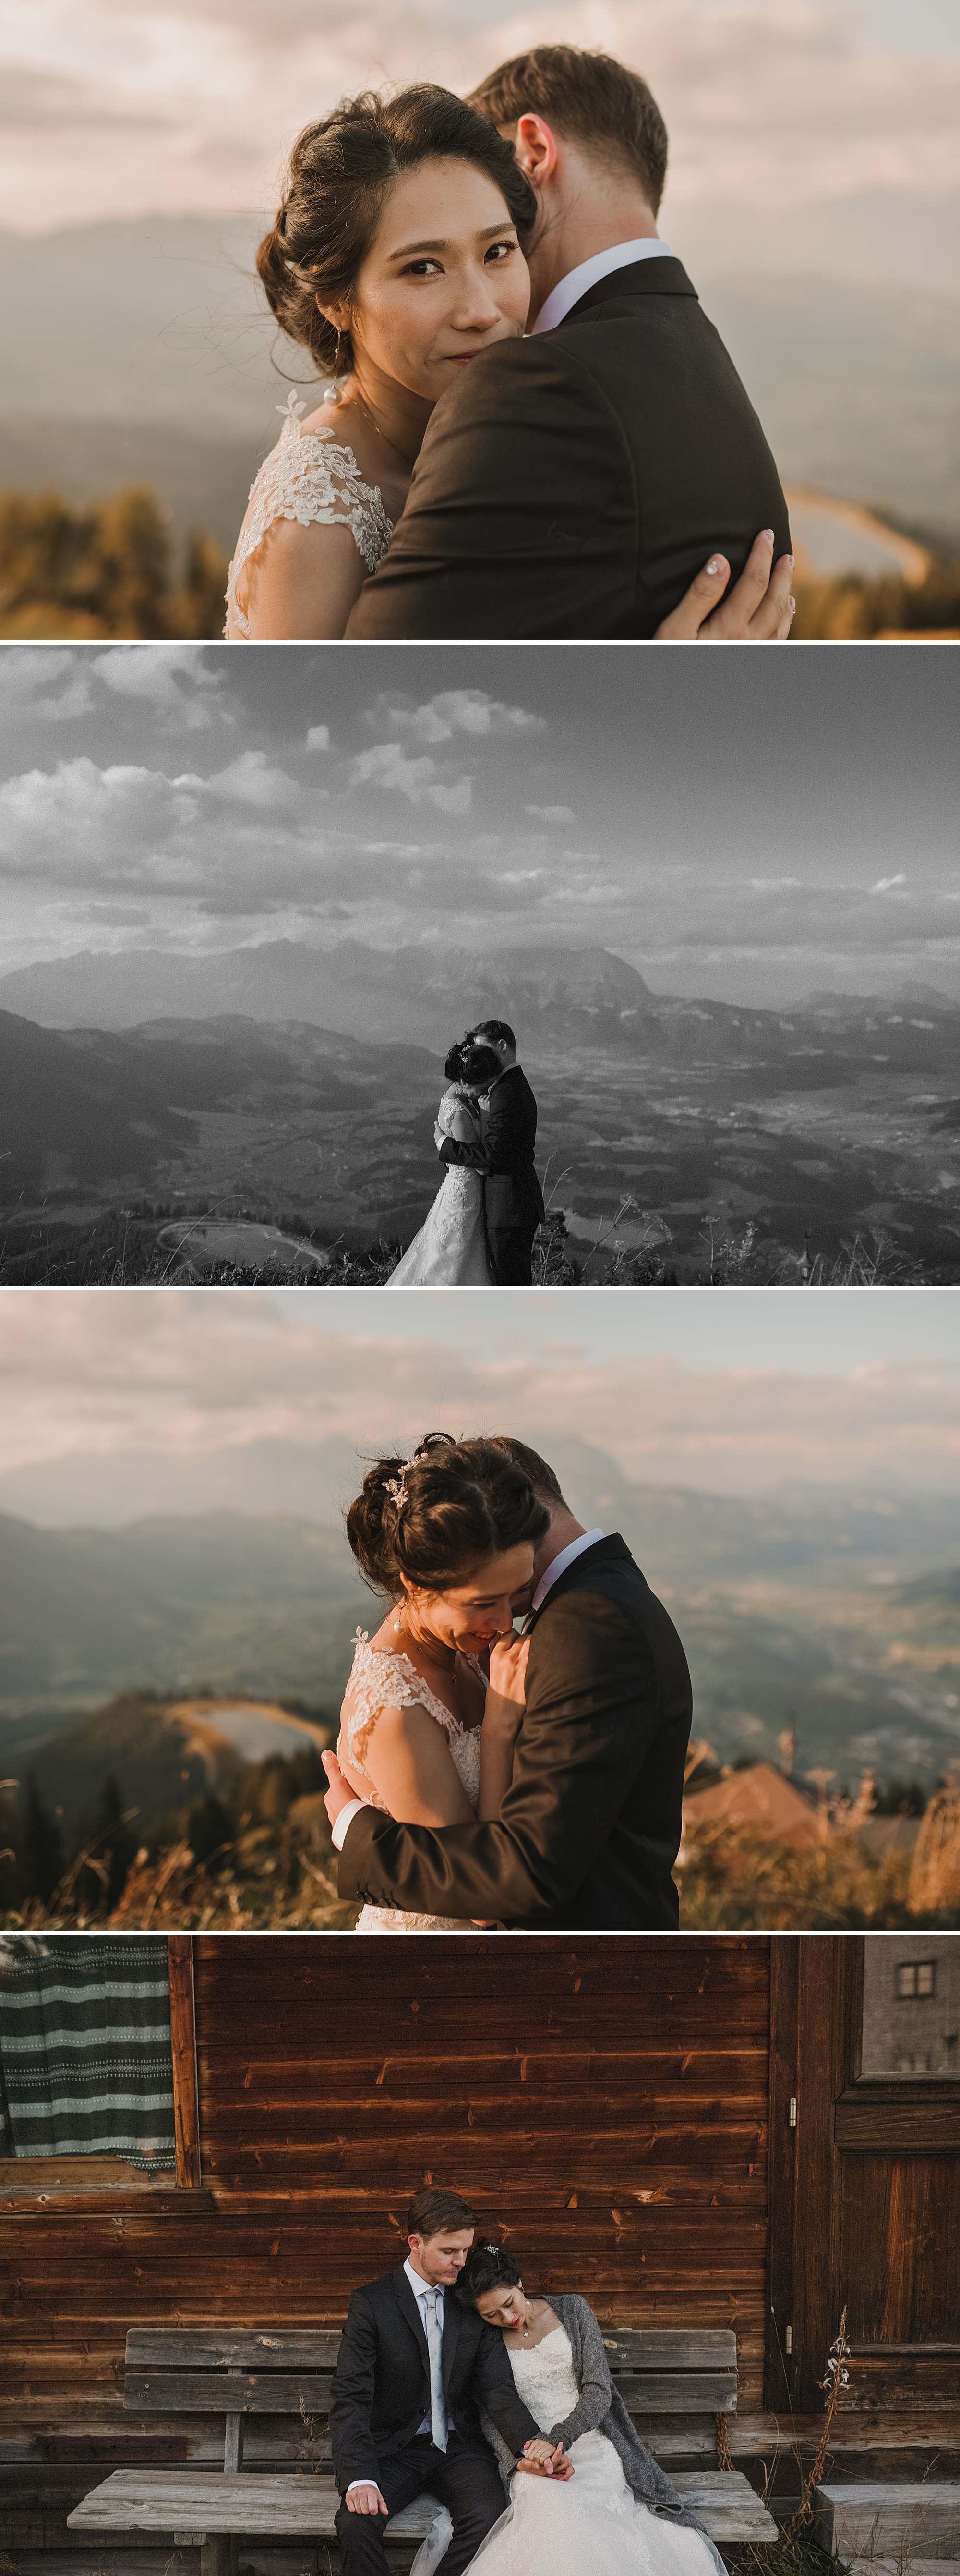 kitzbuehel wedding photographer_0080.jpg